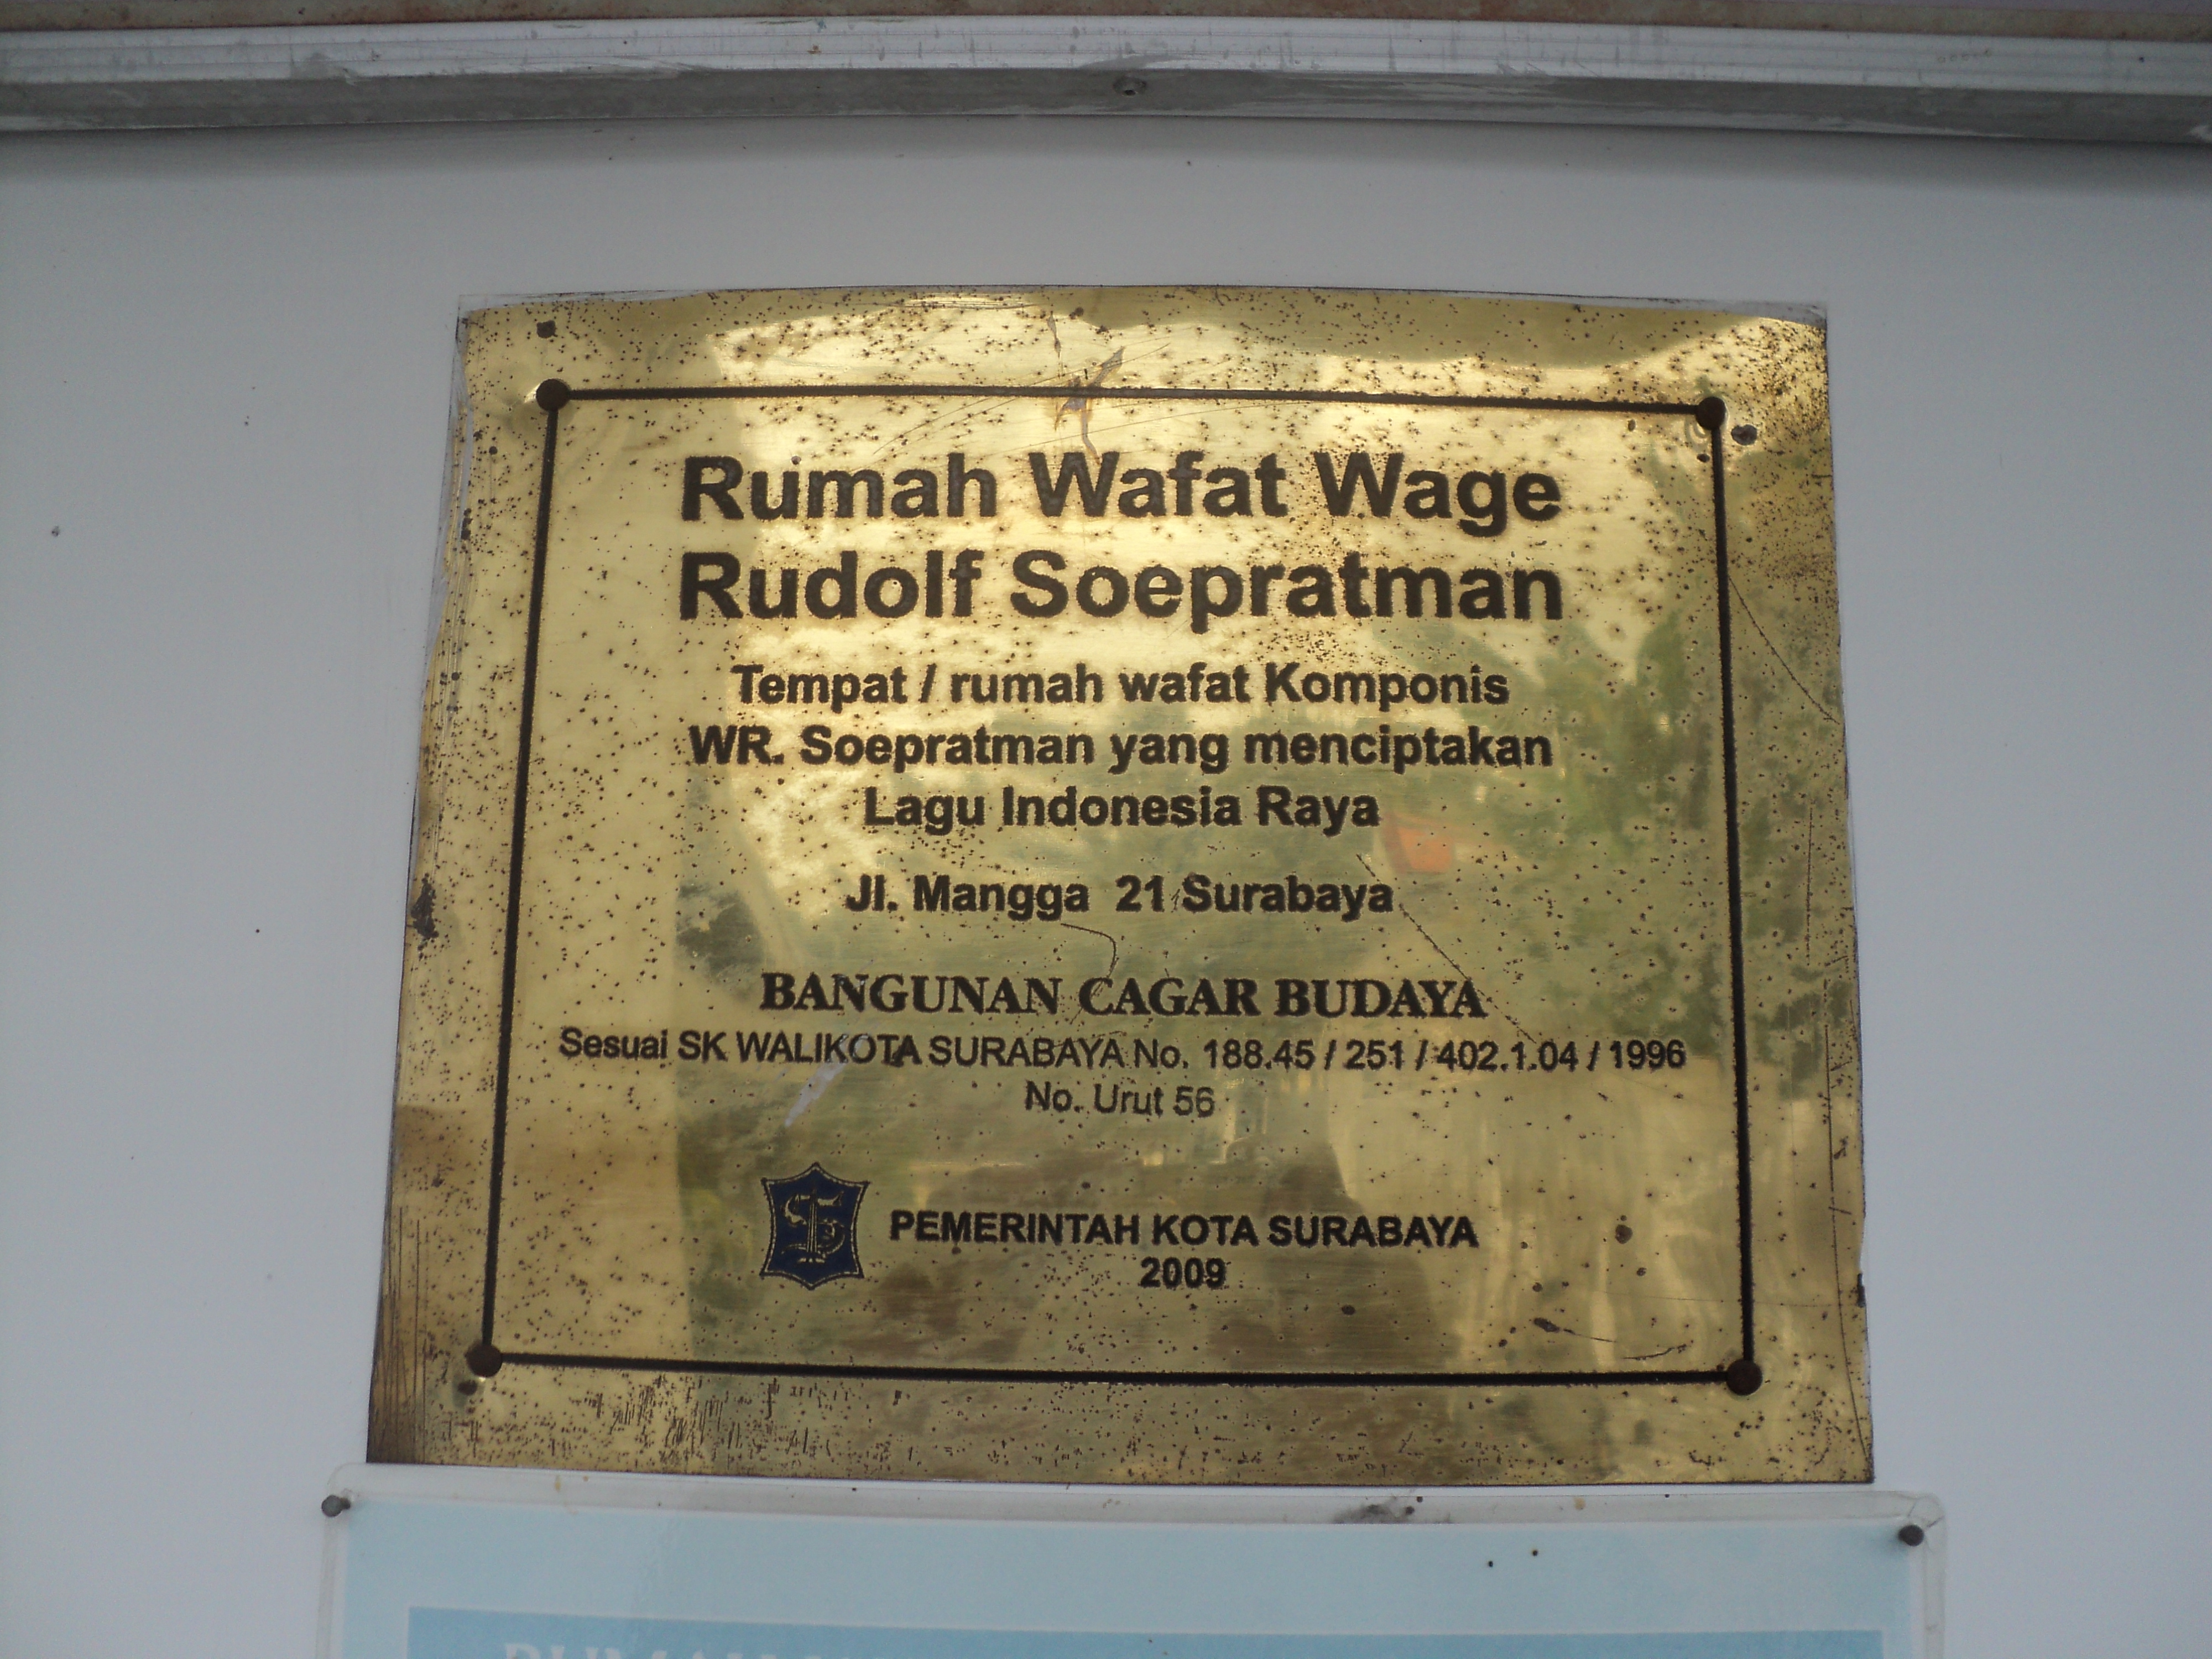 Rumah Wr Supratman Pesona Cagar Budaya Surabaya Plakat Wafat Wisata